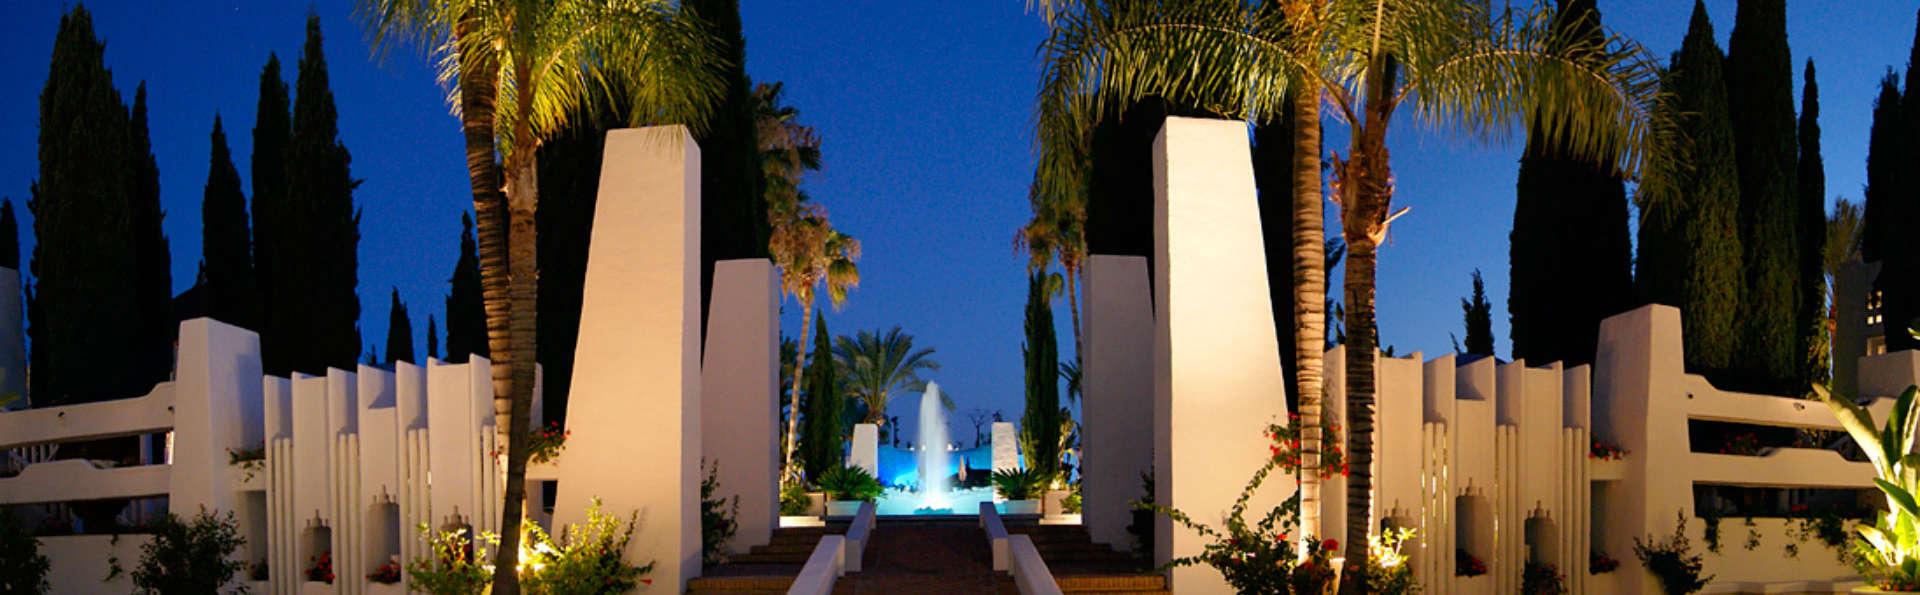 Hotel Suites Albayzín del Mar - EDIT_front33.jpg